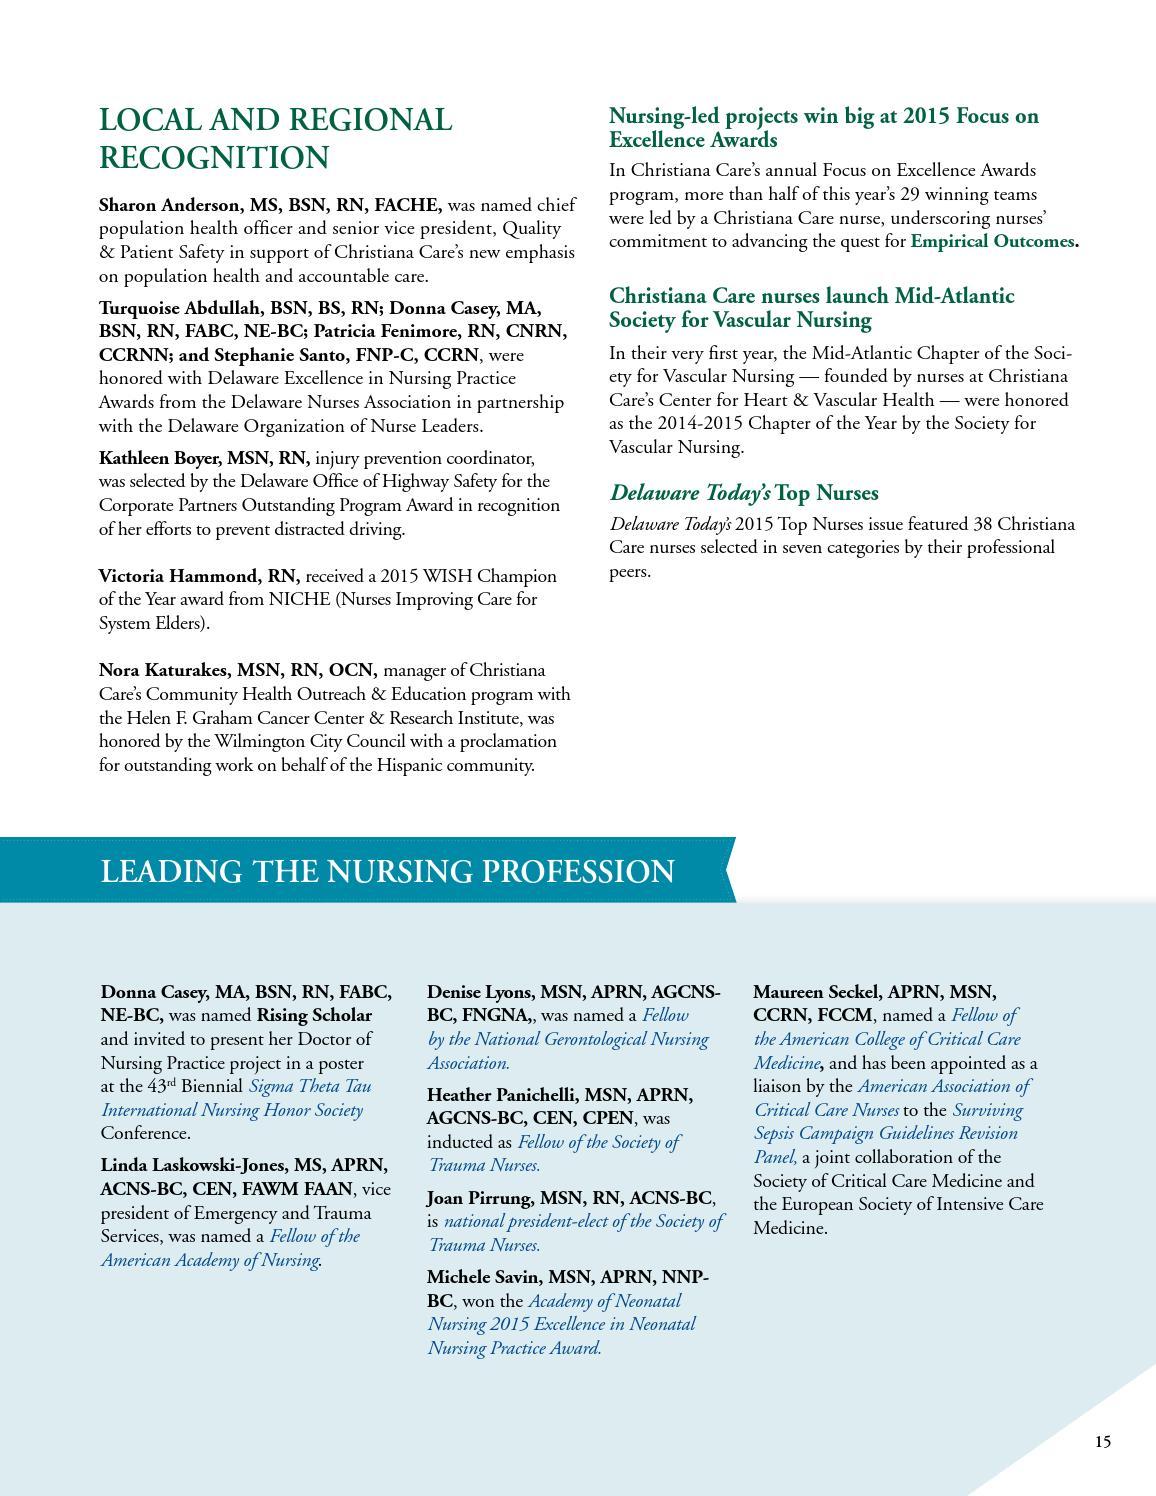 Christiana Care 2015 nursing annual report by Christiana